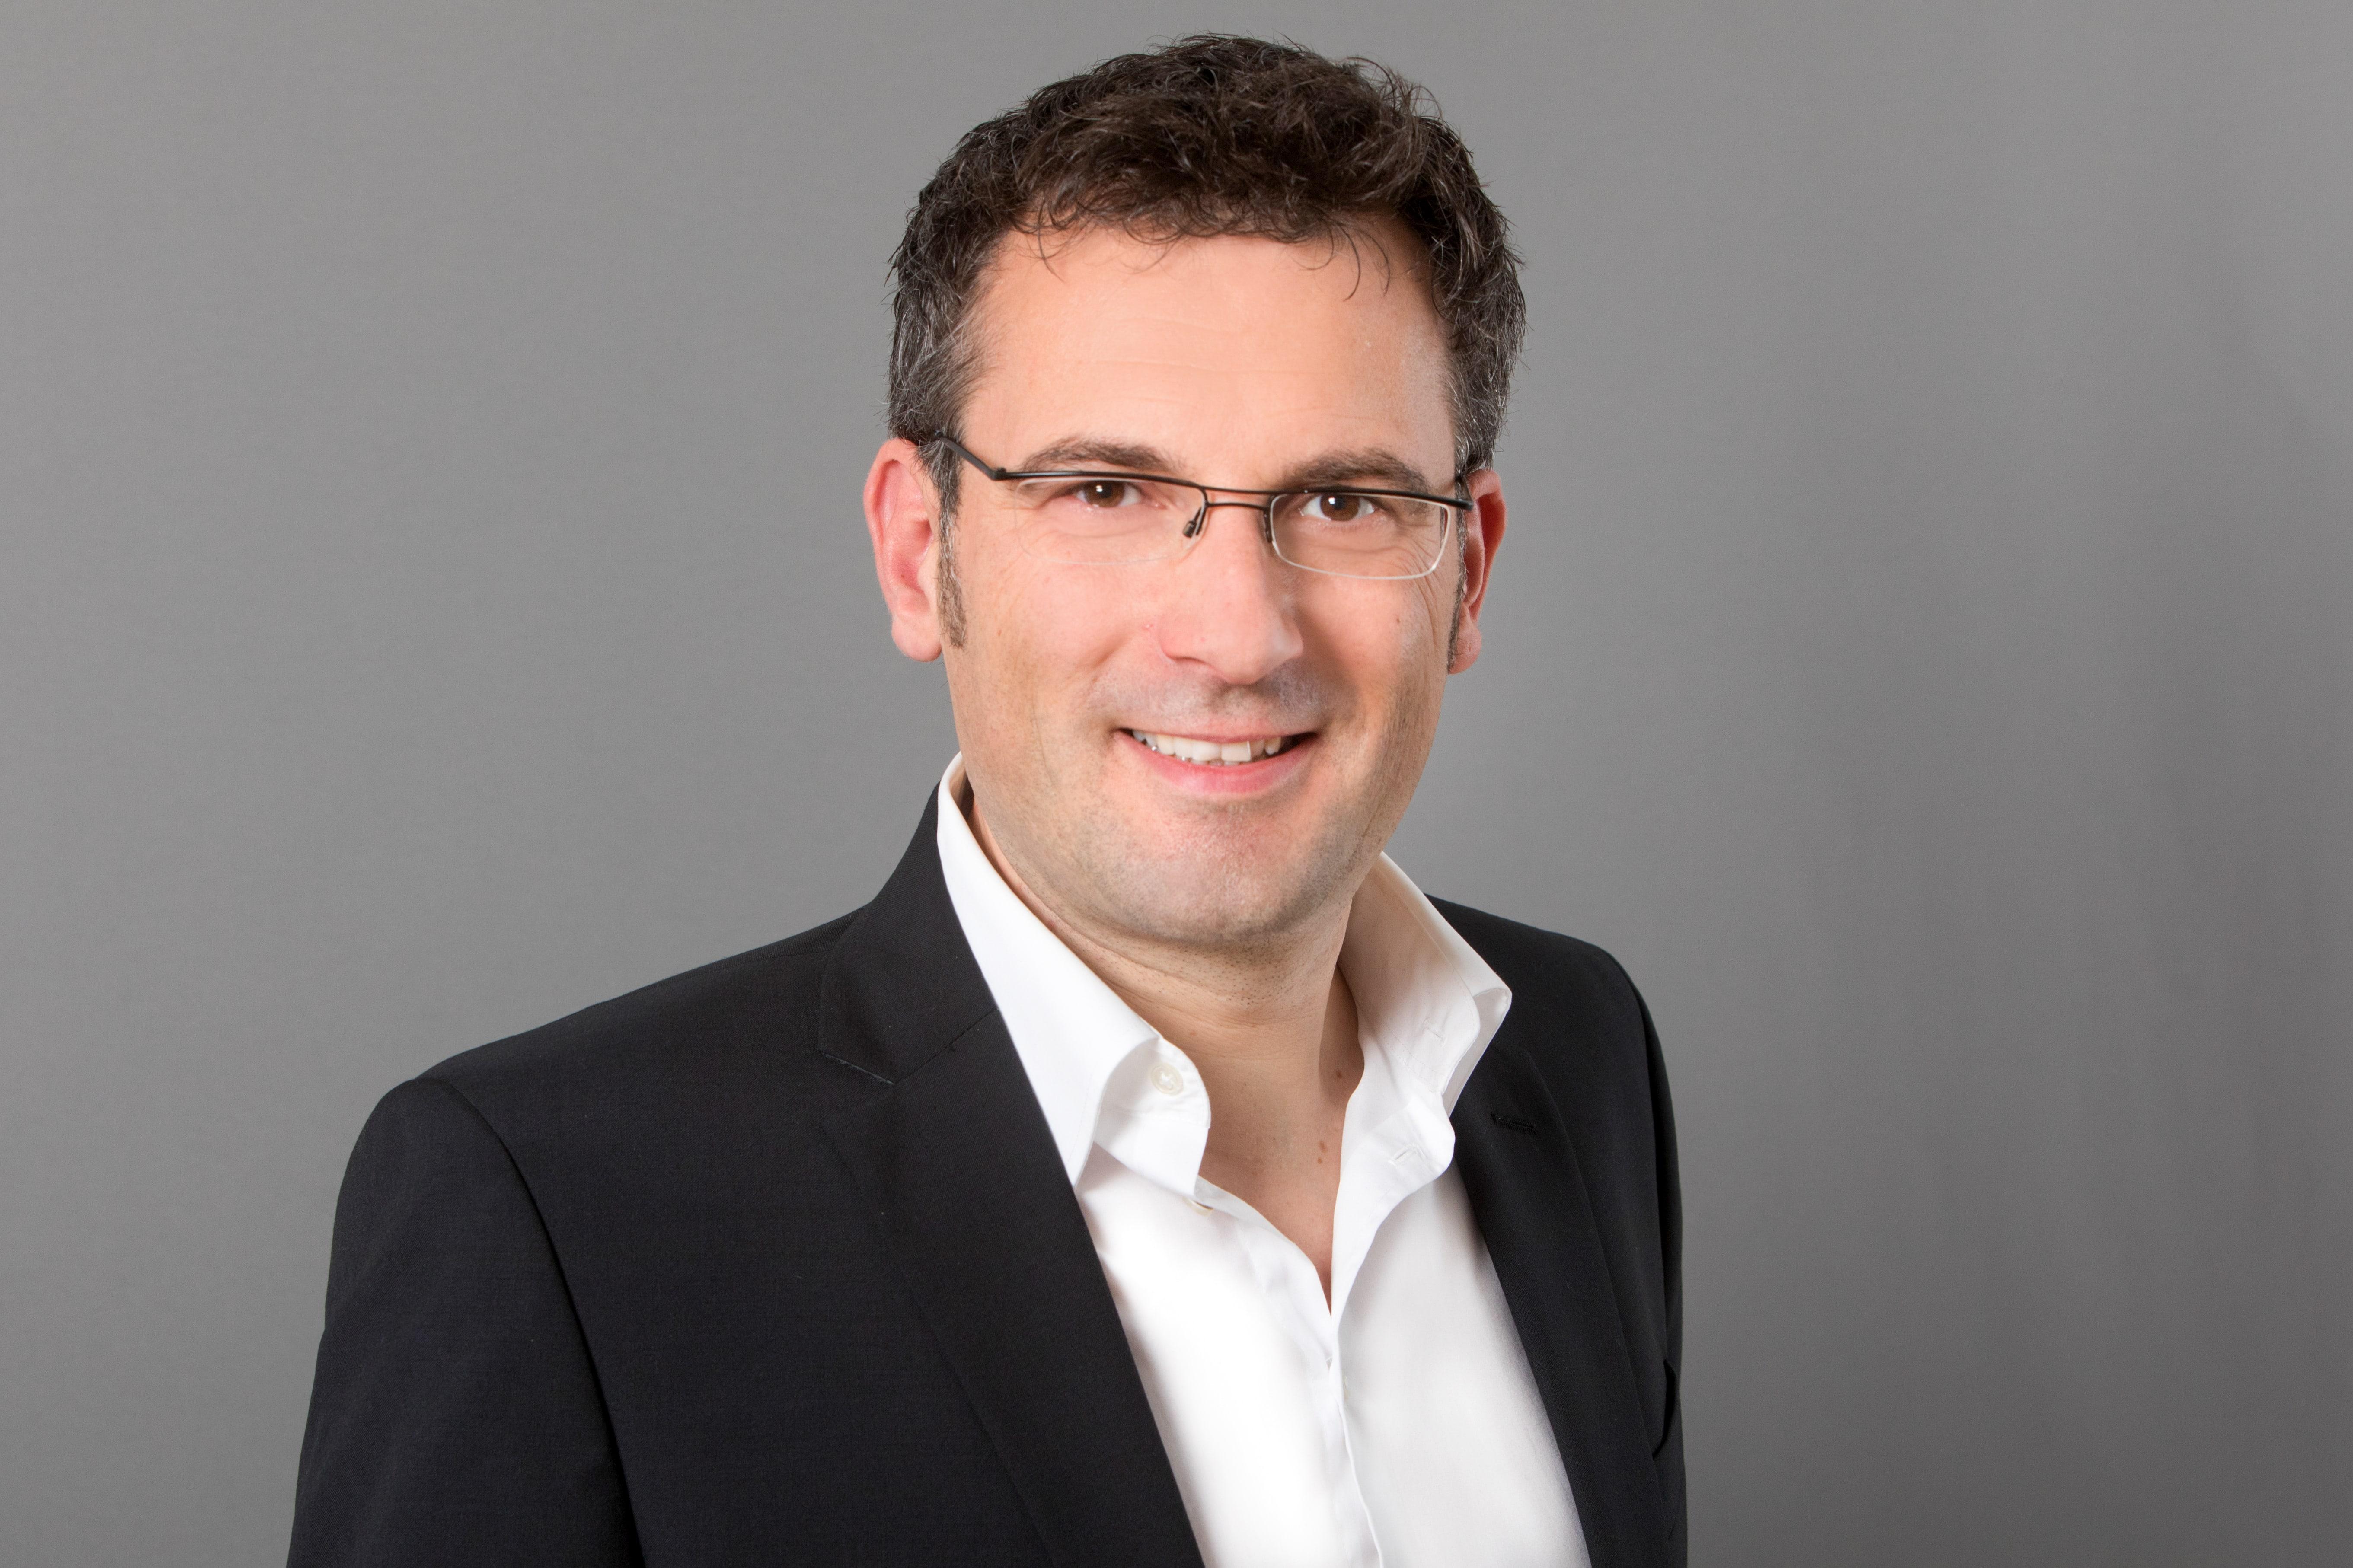 Ralf Lohmeier